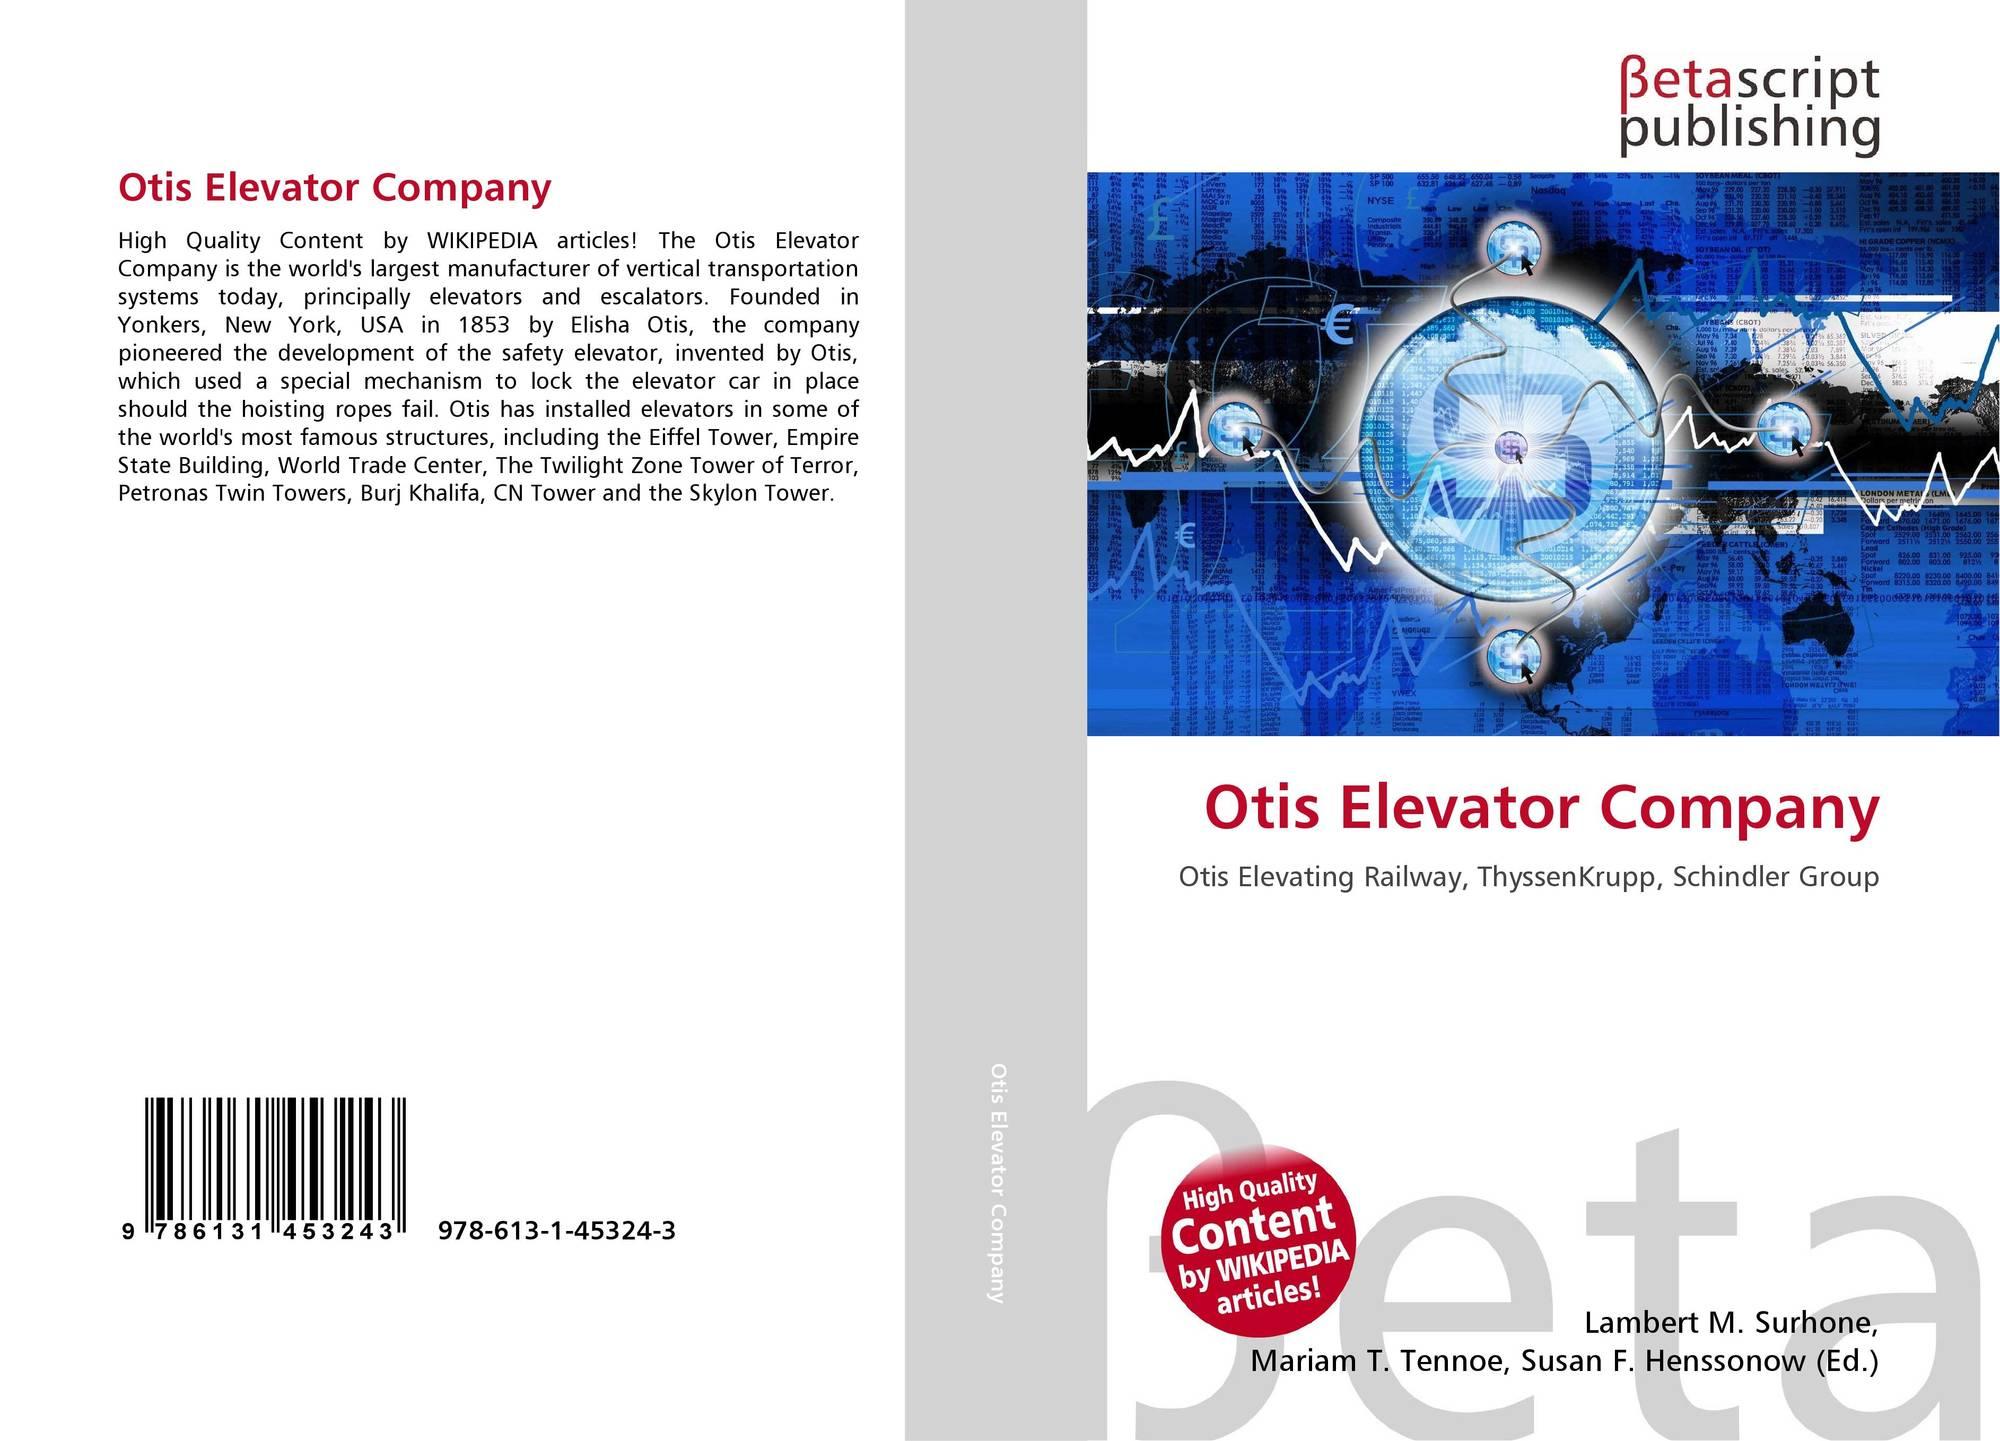 Otis Elevator Company, 978-613-1-45324-3, 6131453241 ,9786131453243